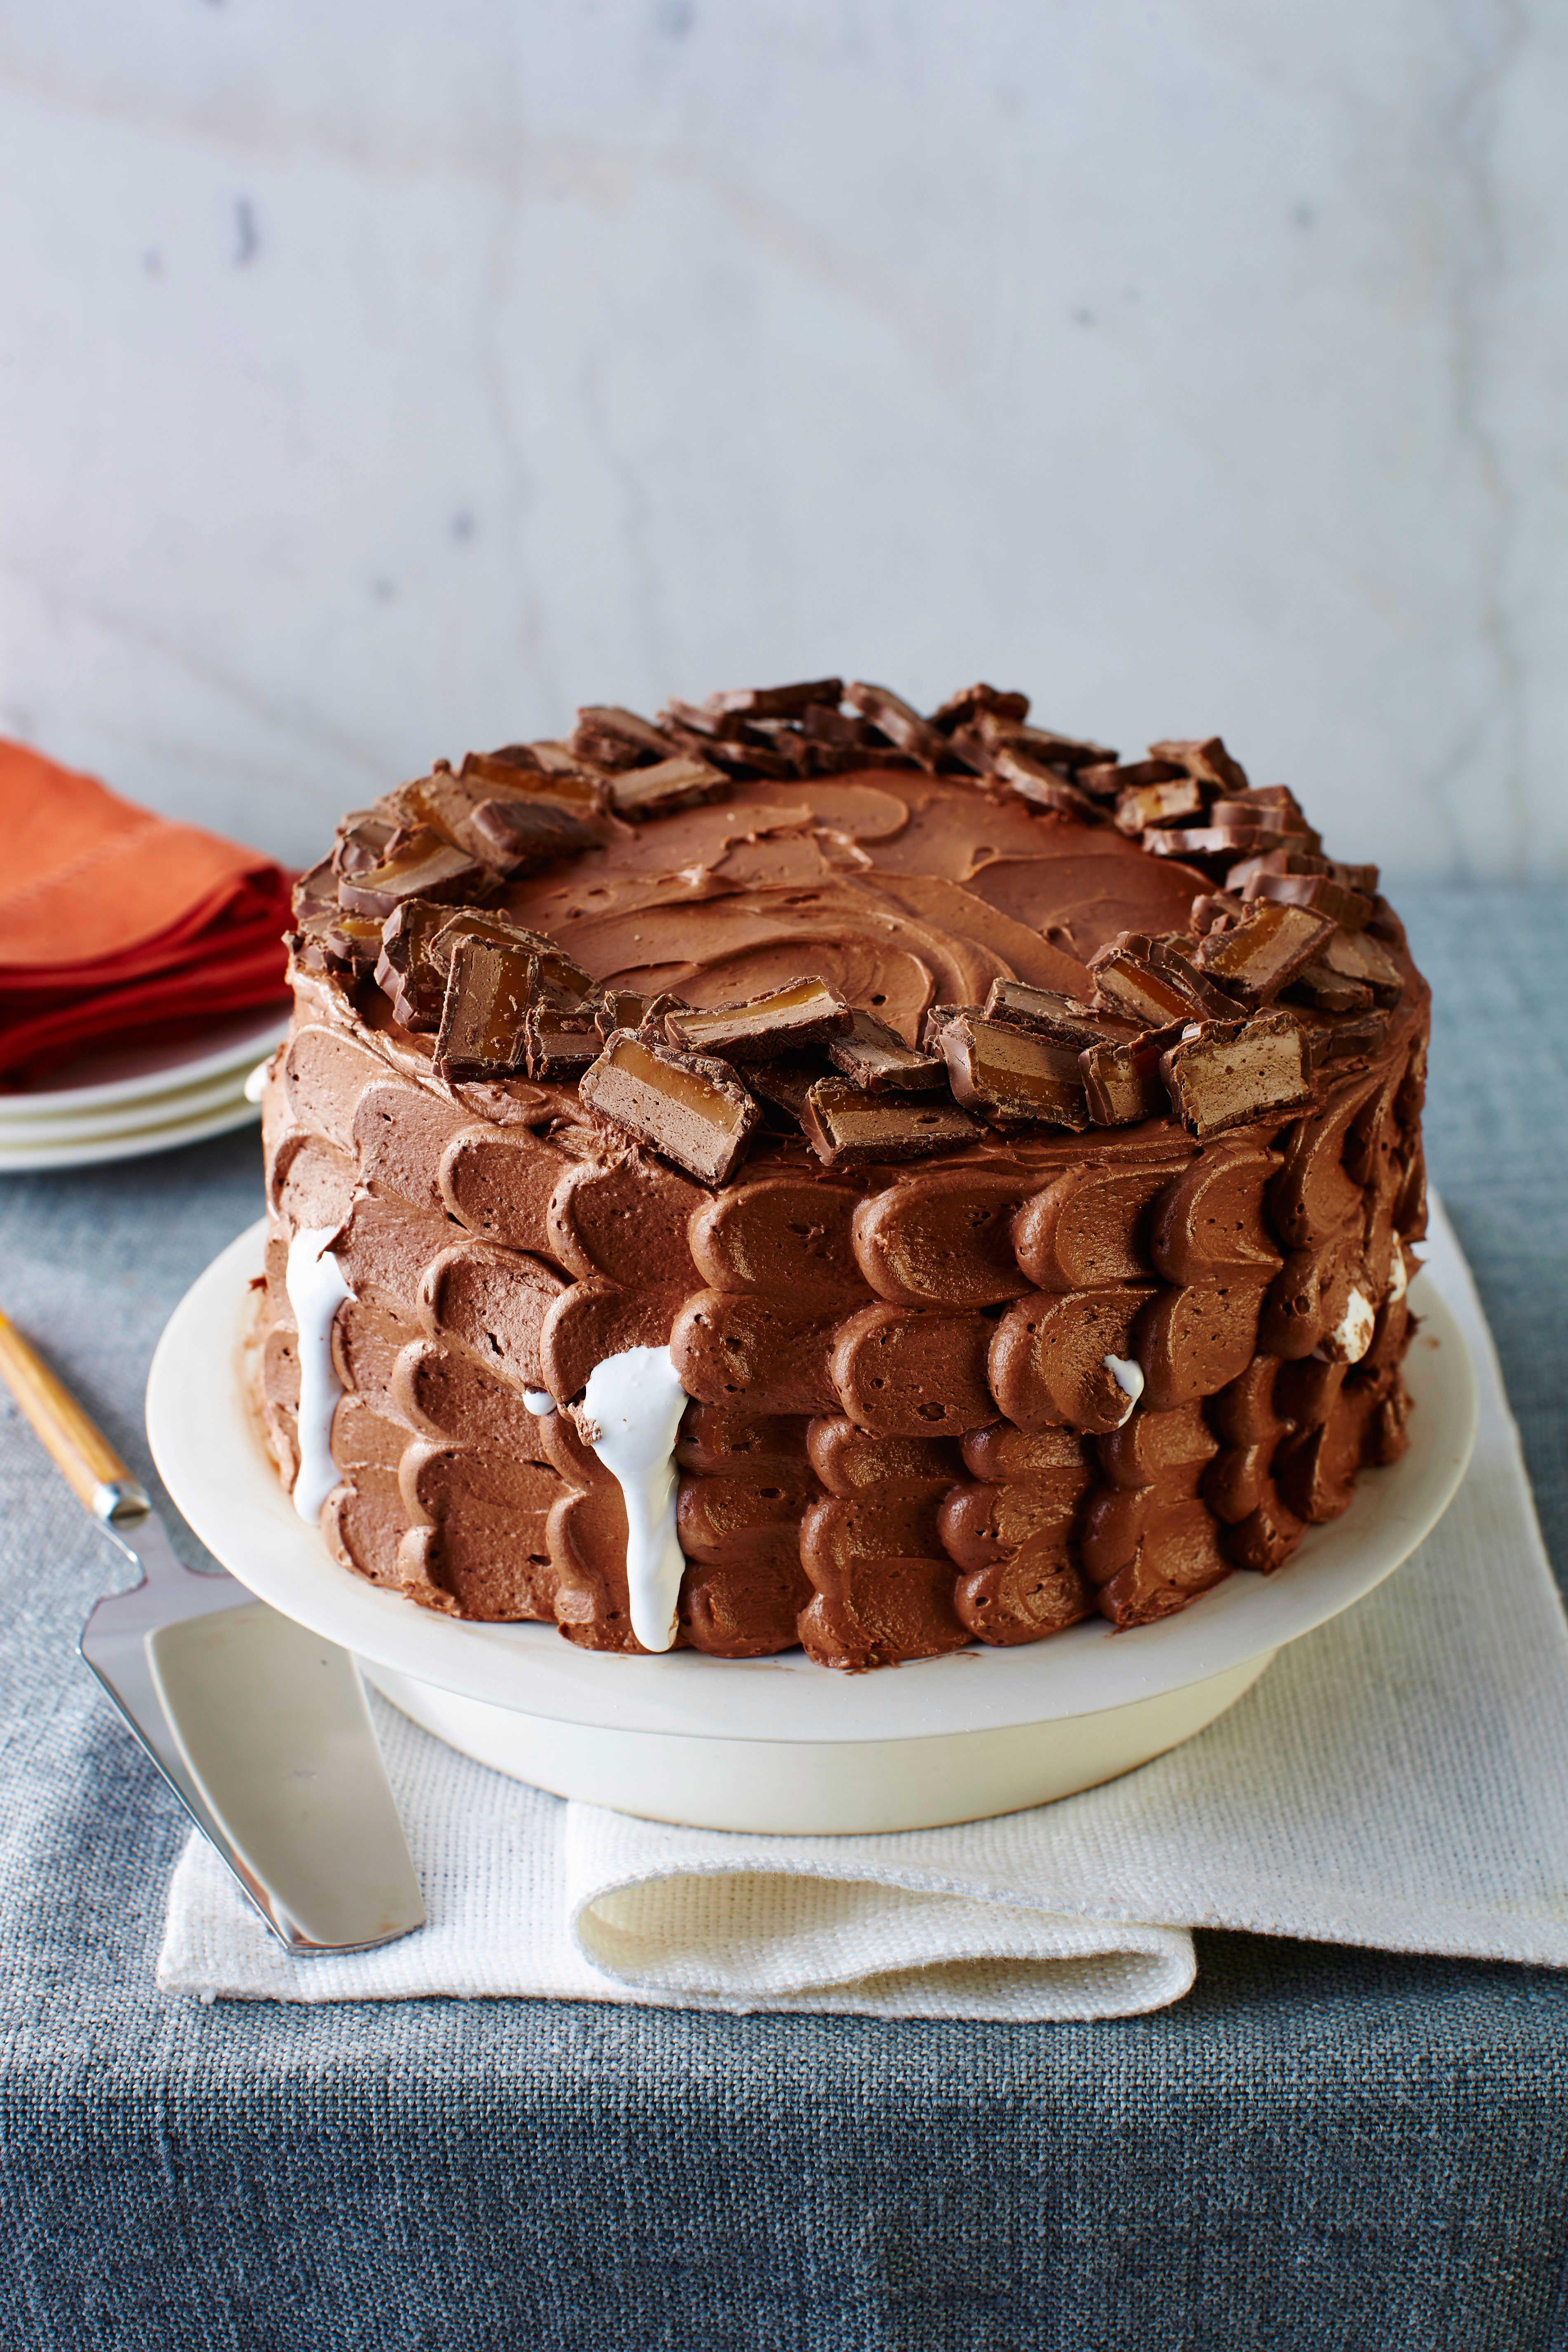 milky way cake recipe - HD3000×4500